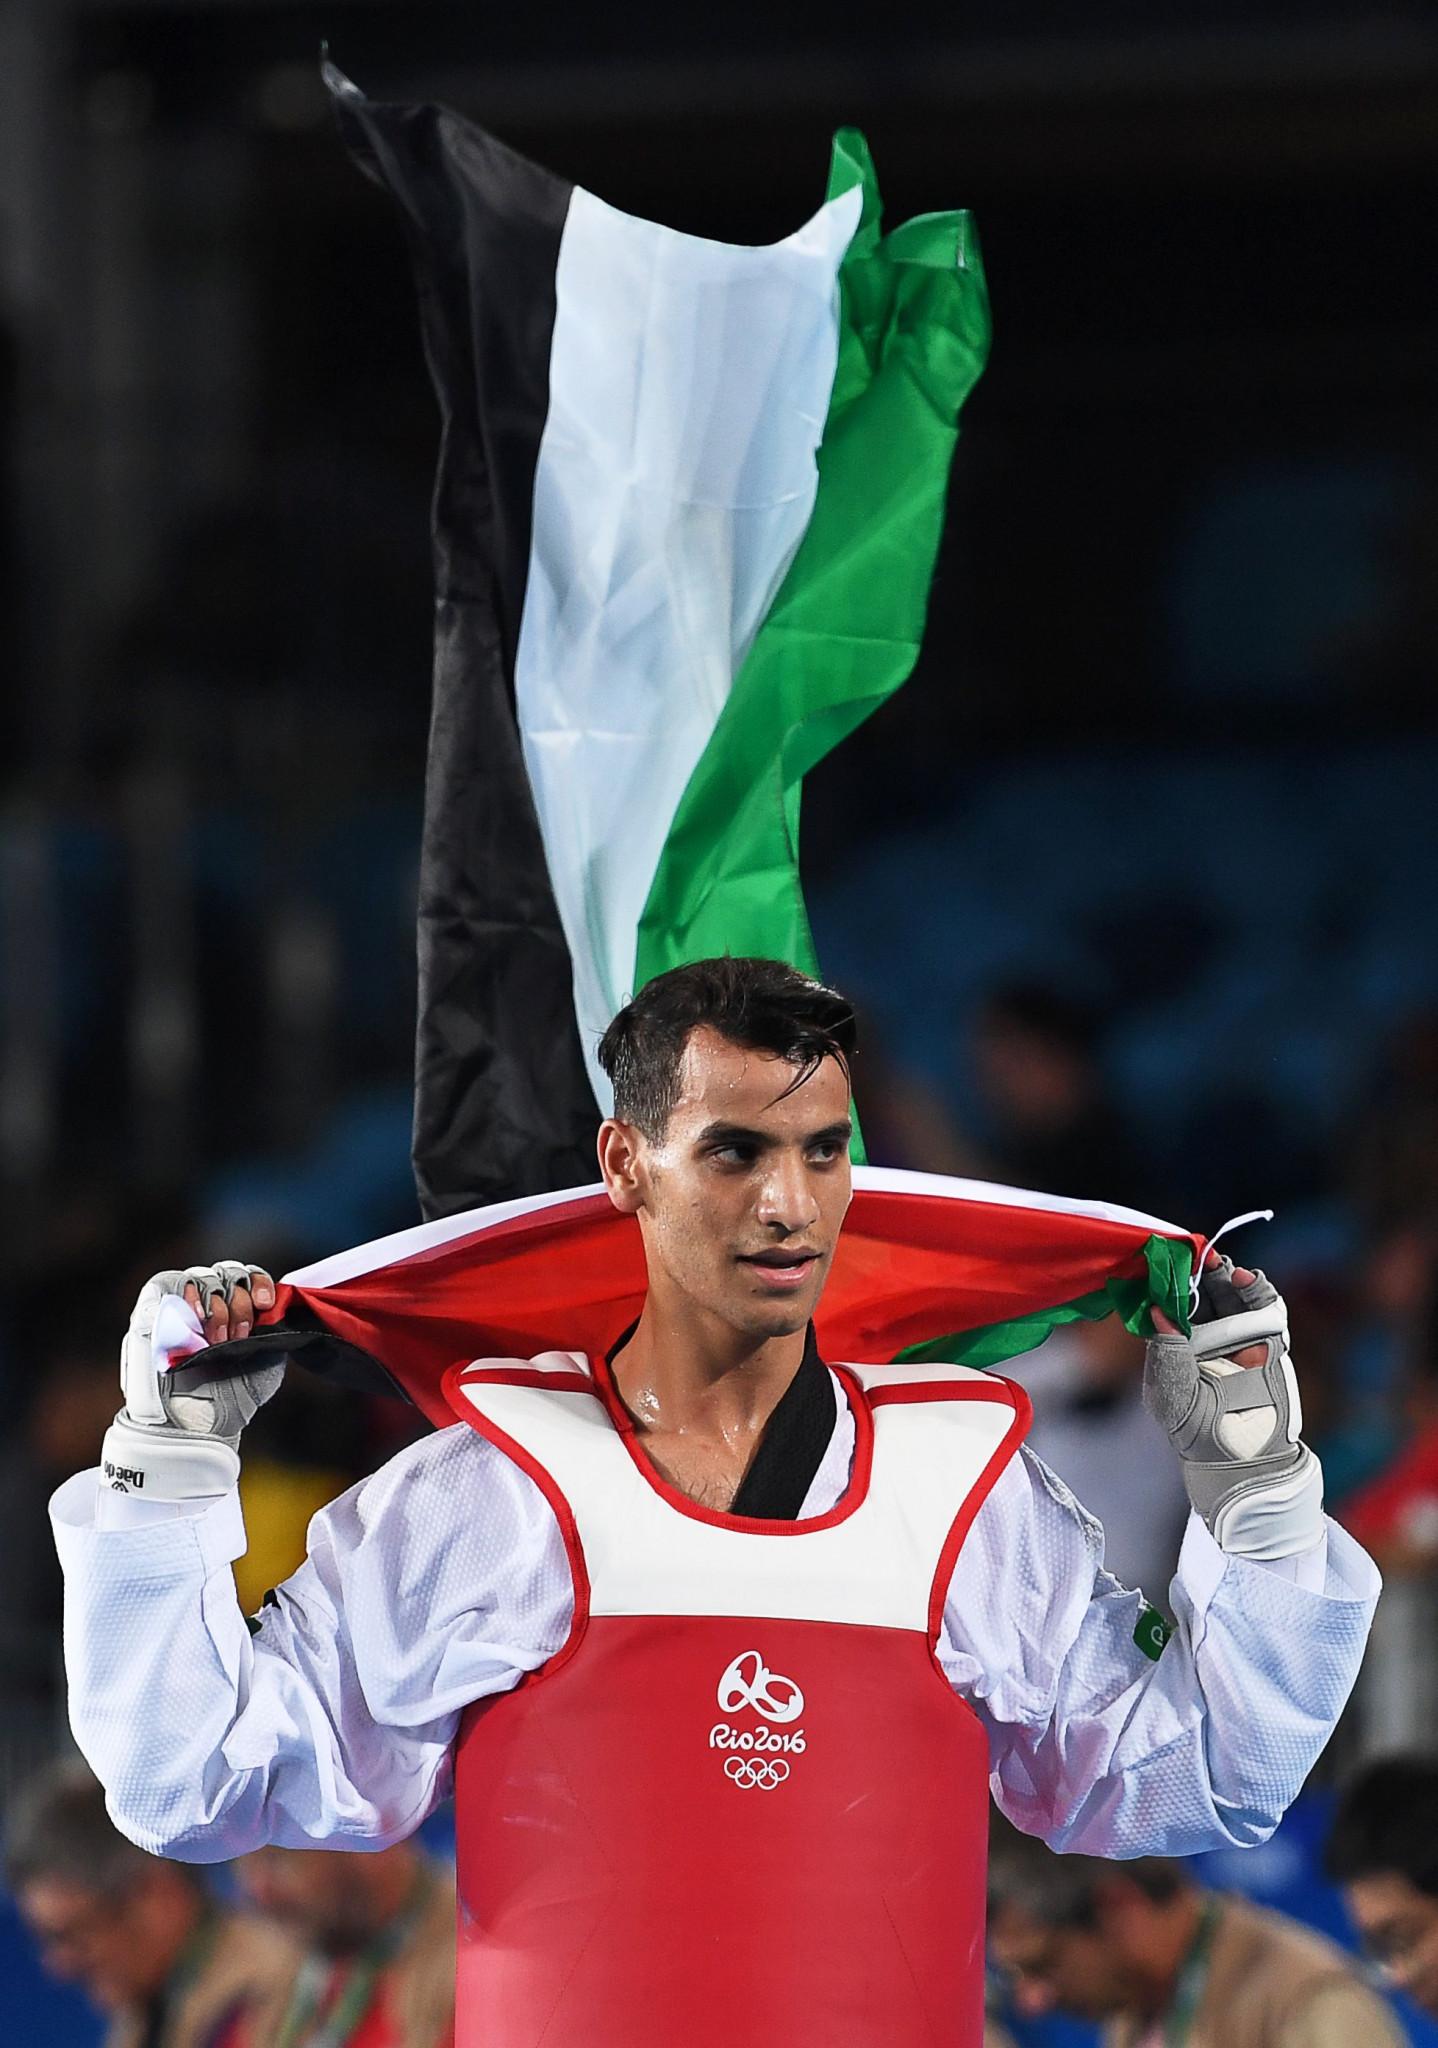 Ahmad Abu Ghaush became Jordan's inaugural Olympic champion at Rio 2016 ©Getty Images